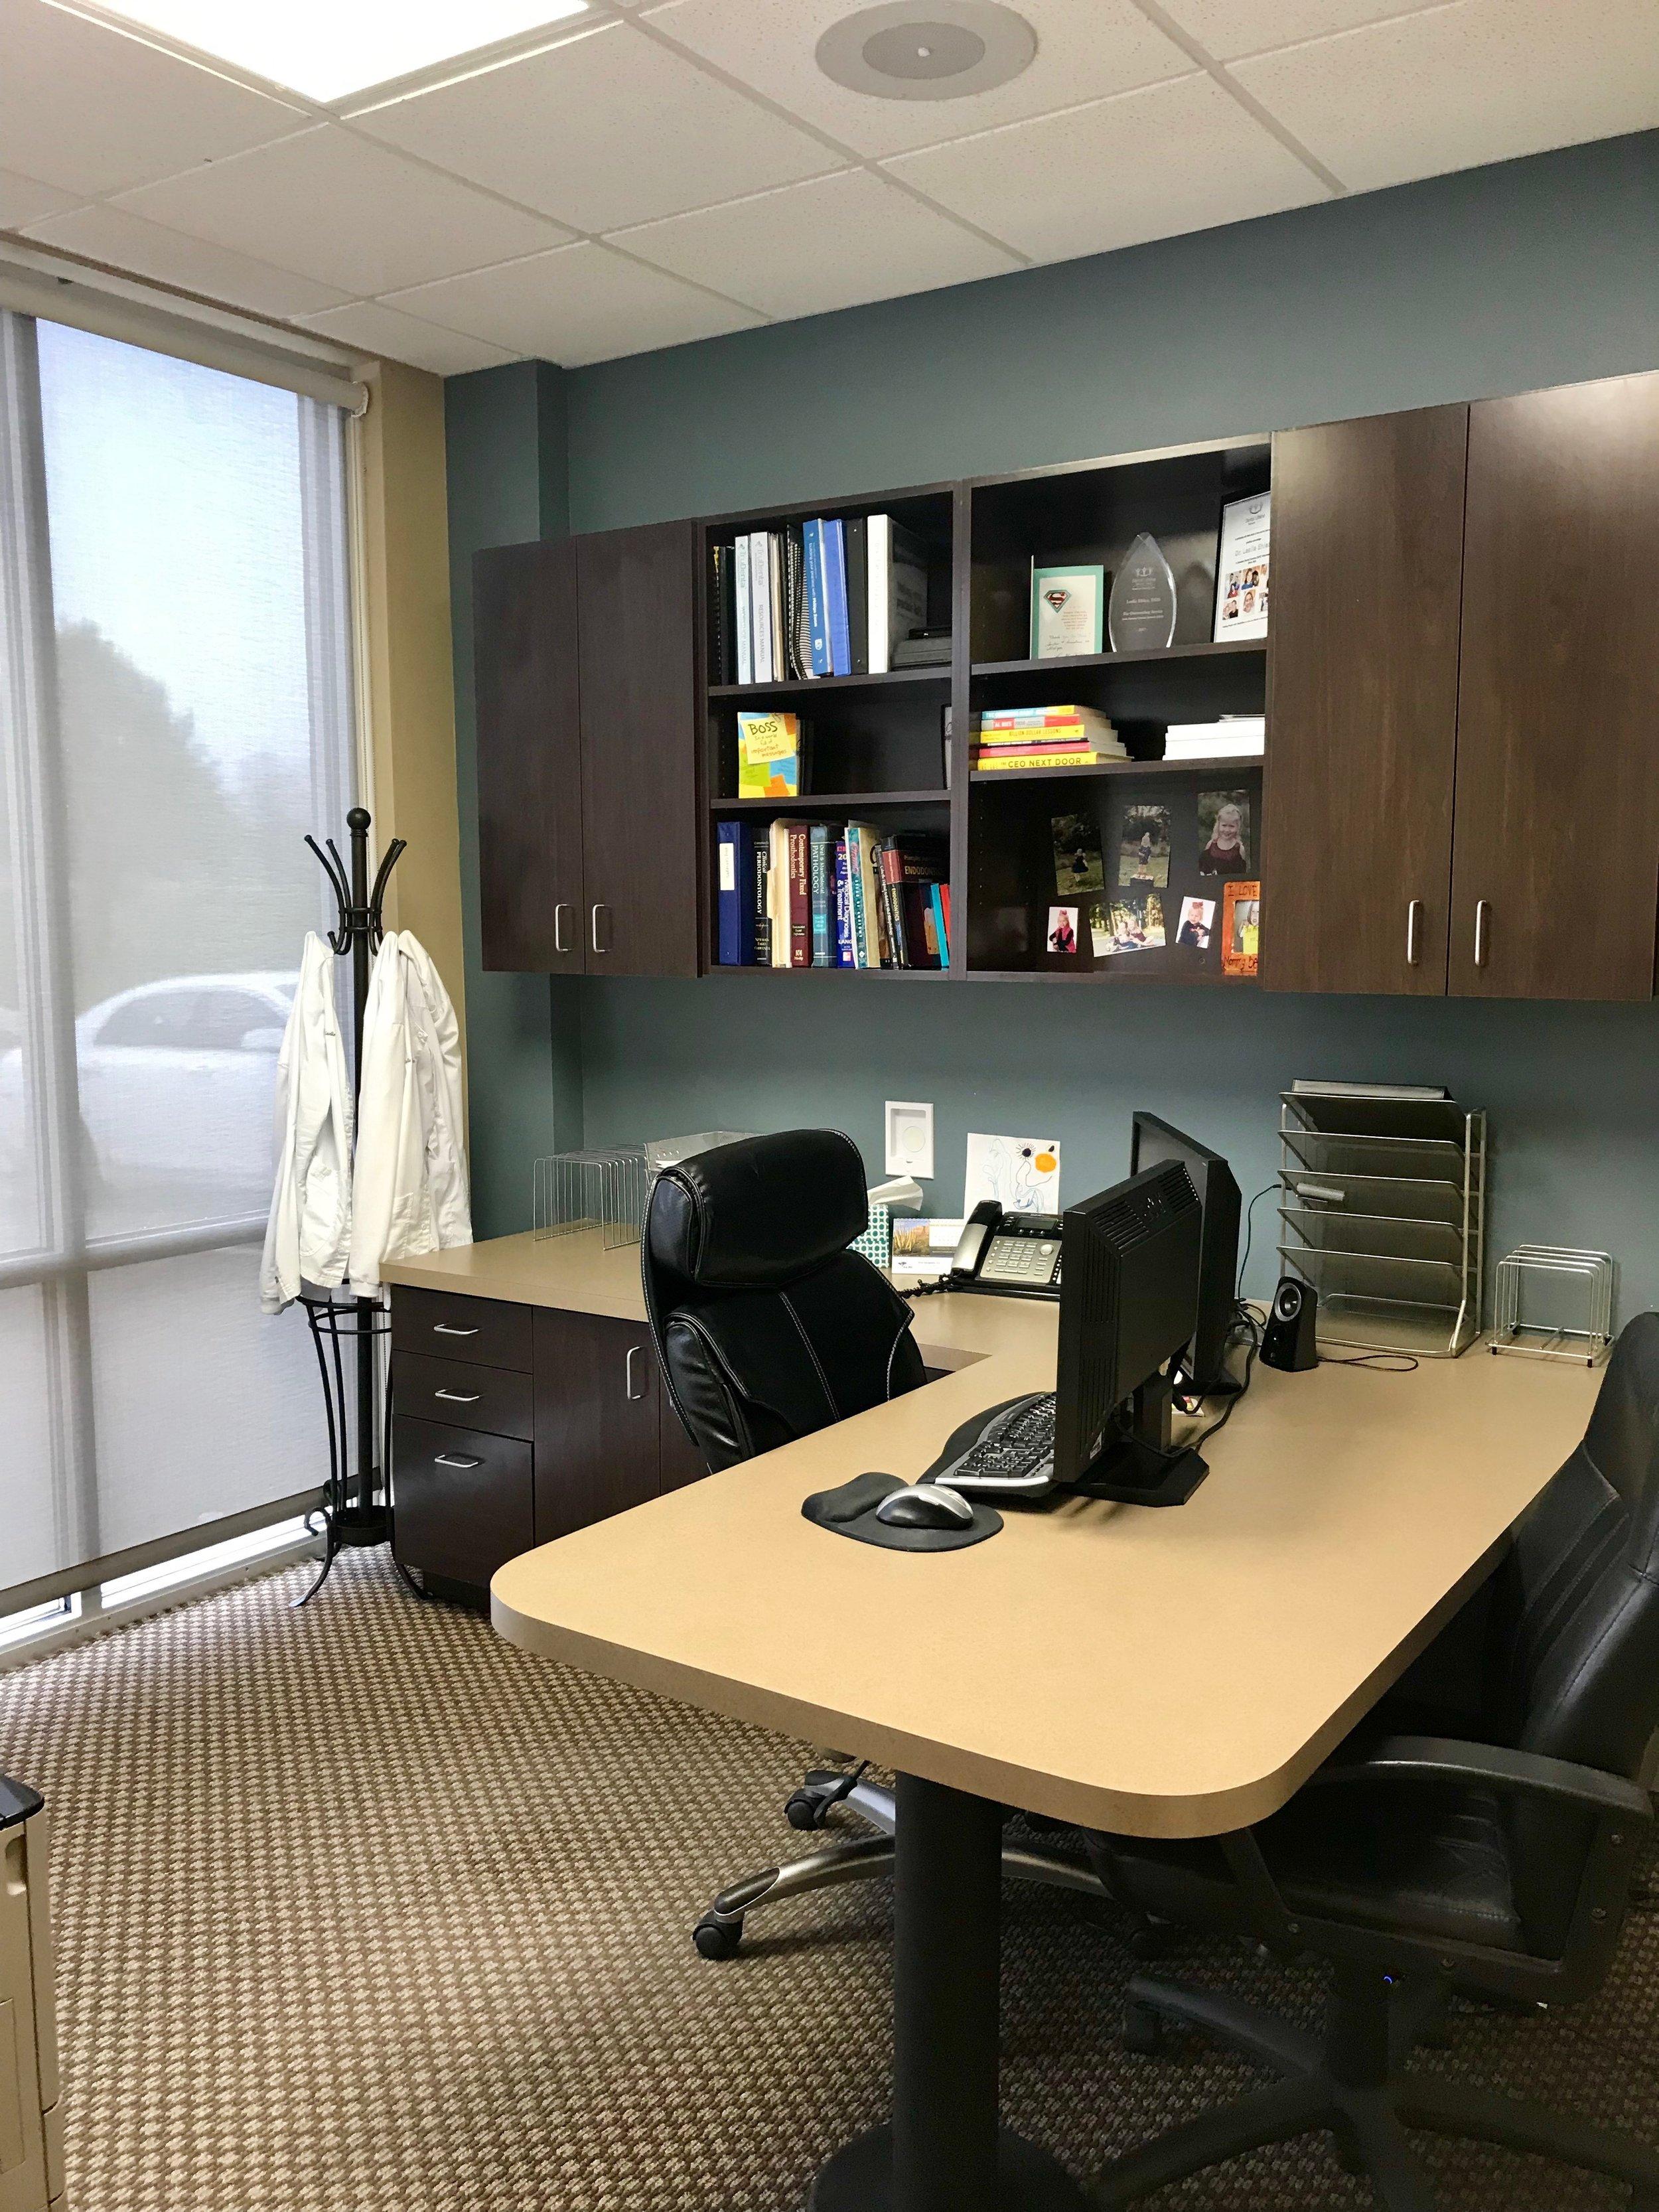 Dr. Ehlen's Office